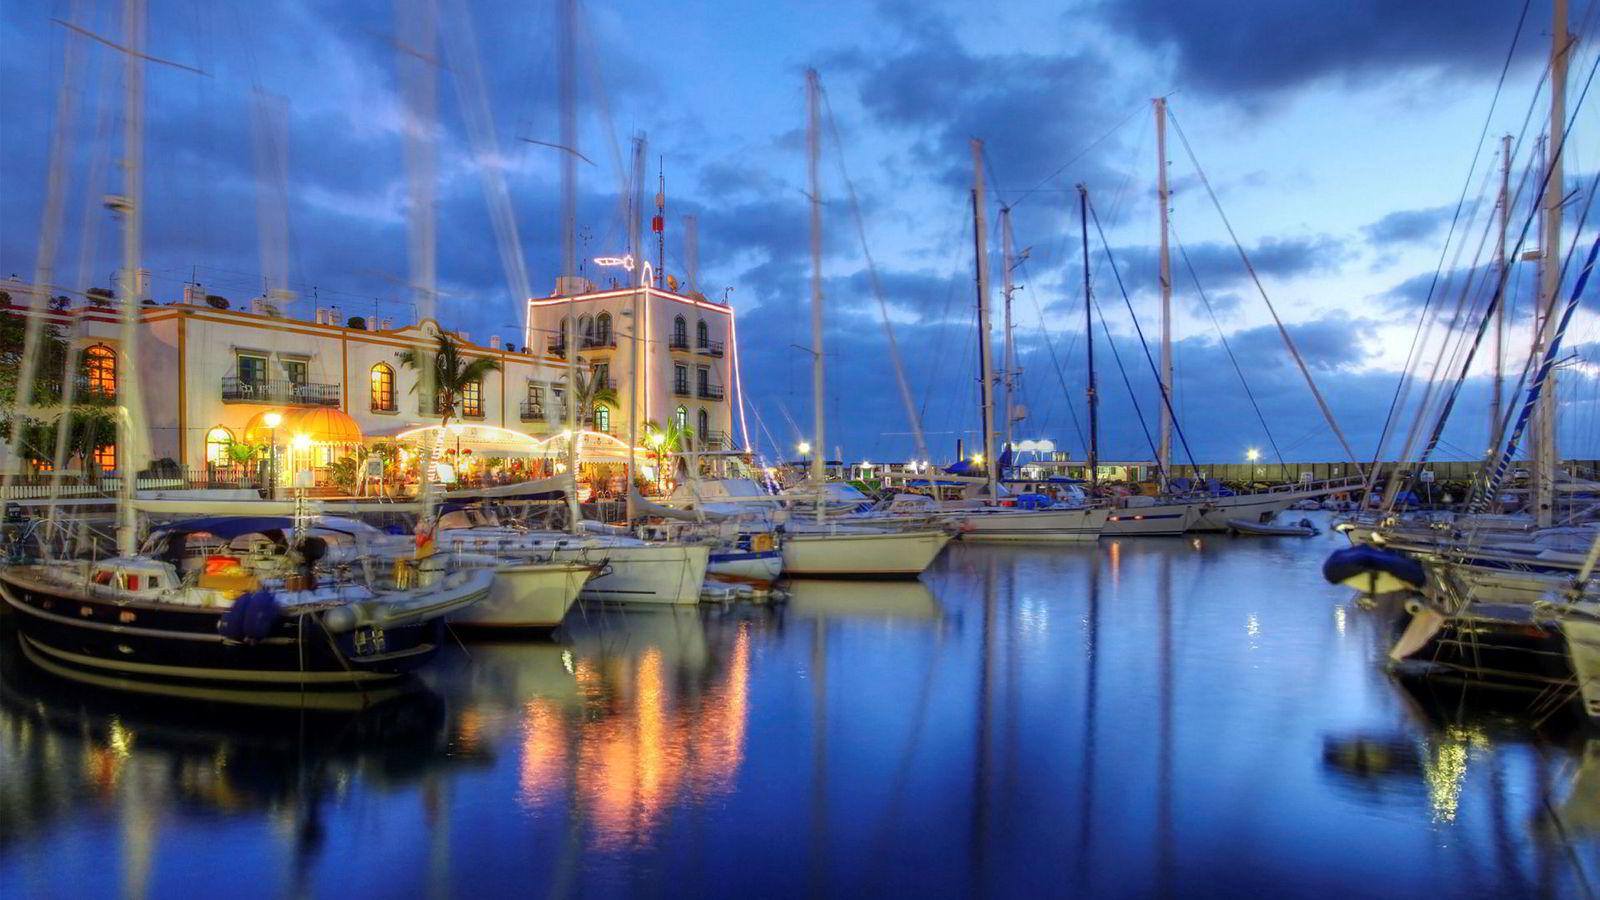 DNB-kunden feiret julen 2017 på Gran Canaria hvor kortet hans ble belastet med 51.000 kroner.